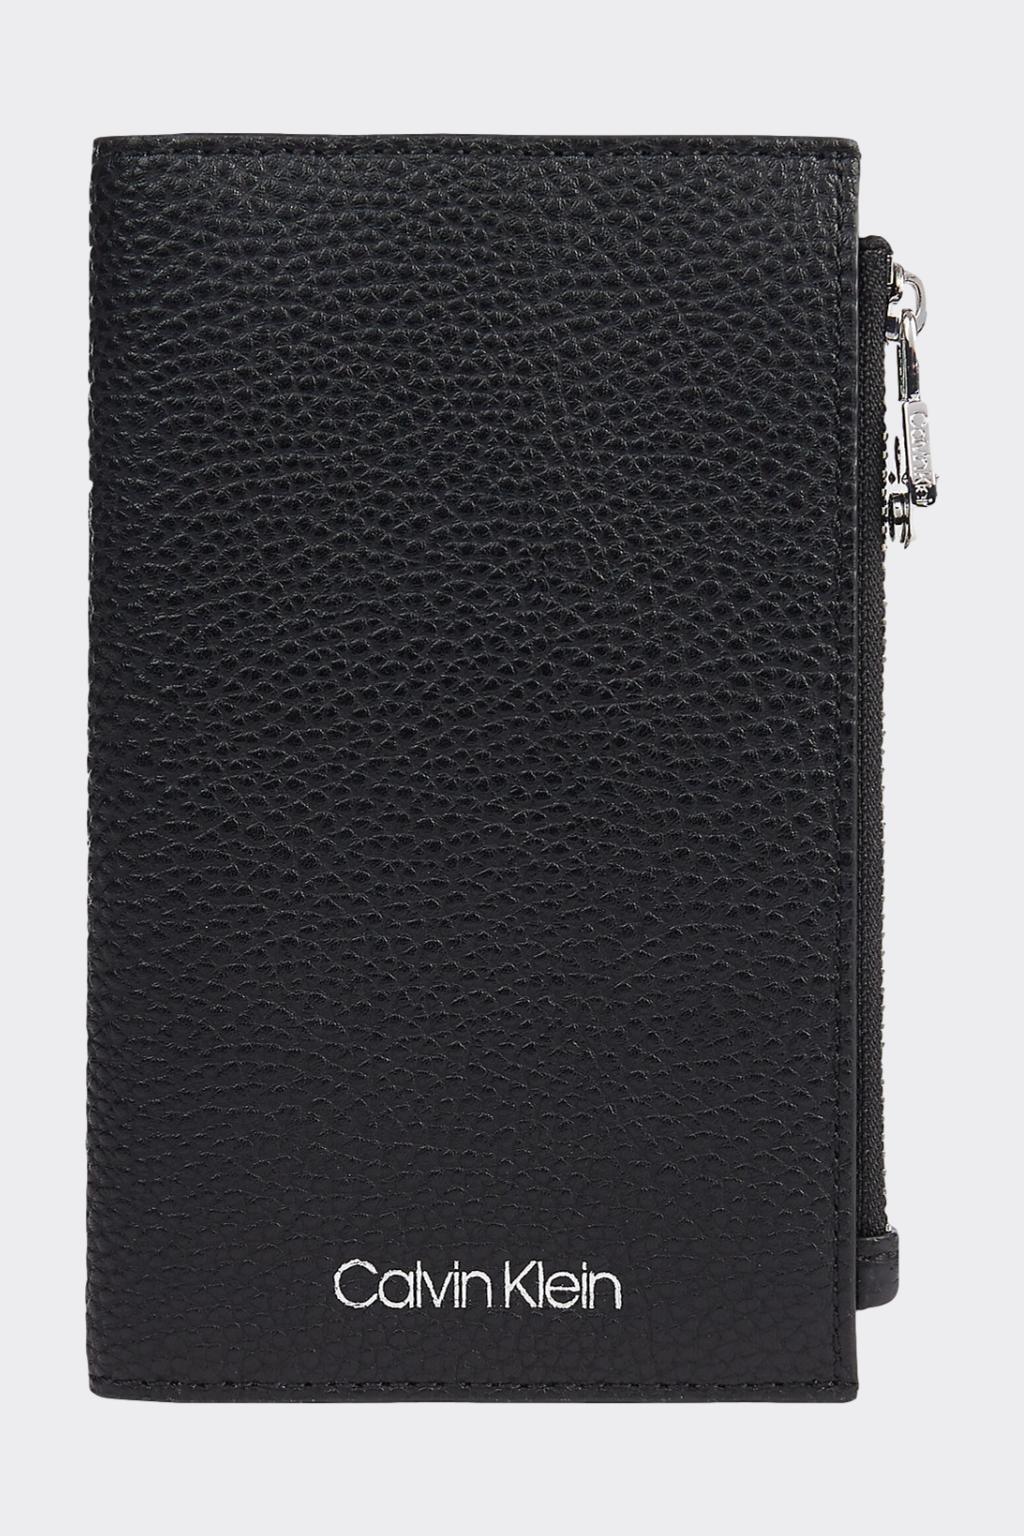 Calvin Klein dámská peněženka - černá